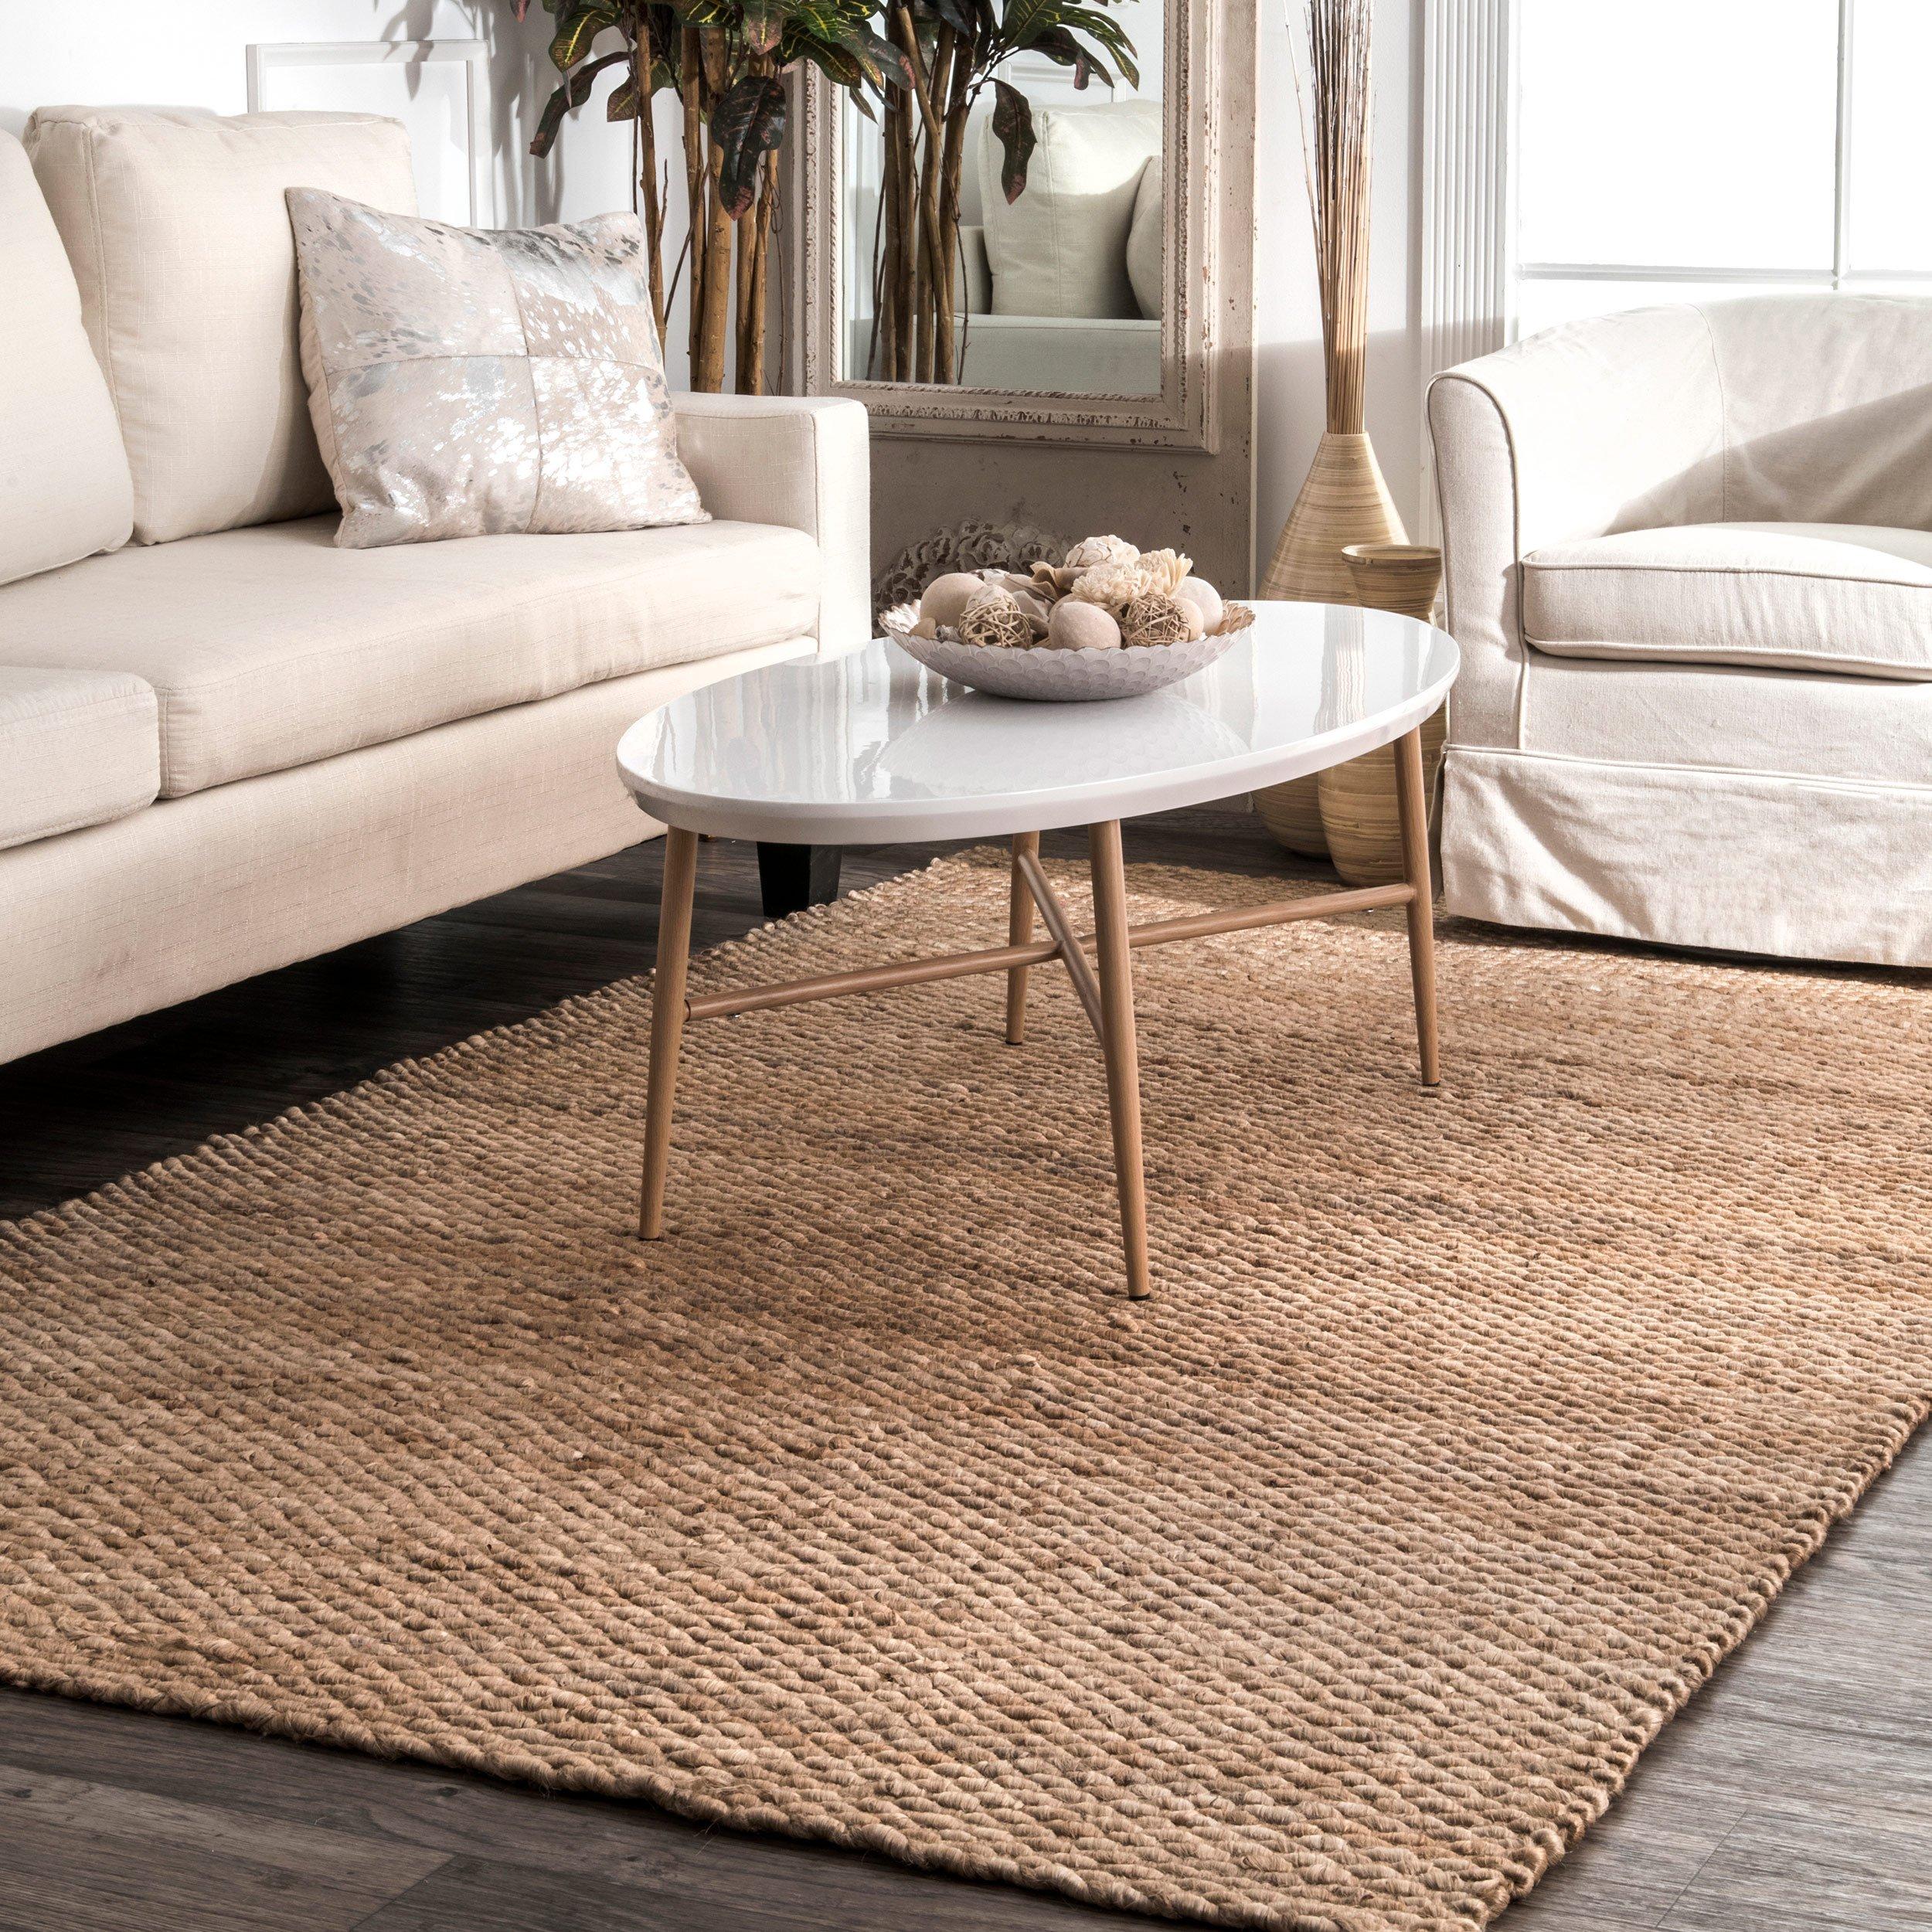 STS Indoor Outdoor Rug Jute Natural Color Rugs Natural Jute Area Runner Rug Handmade Reversible Living Room Patio Mats (2' 6'' x 8' Runner)